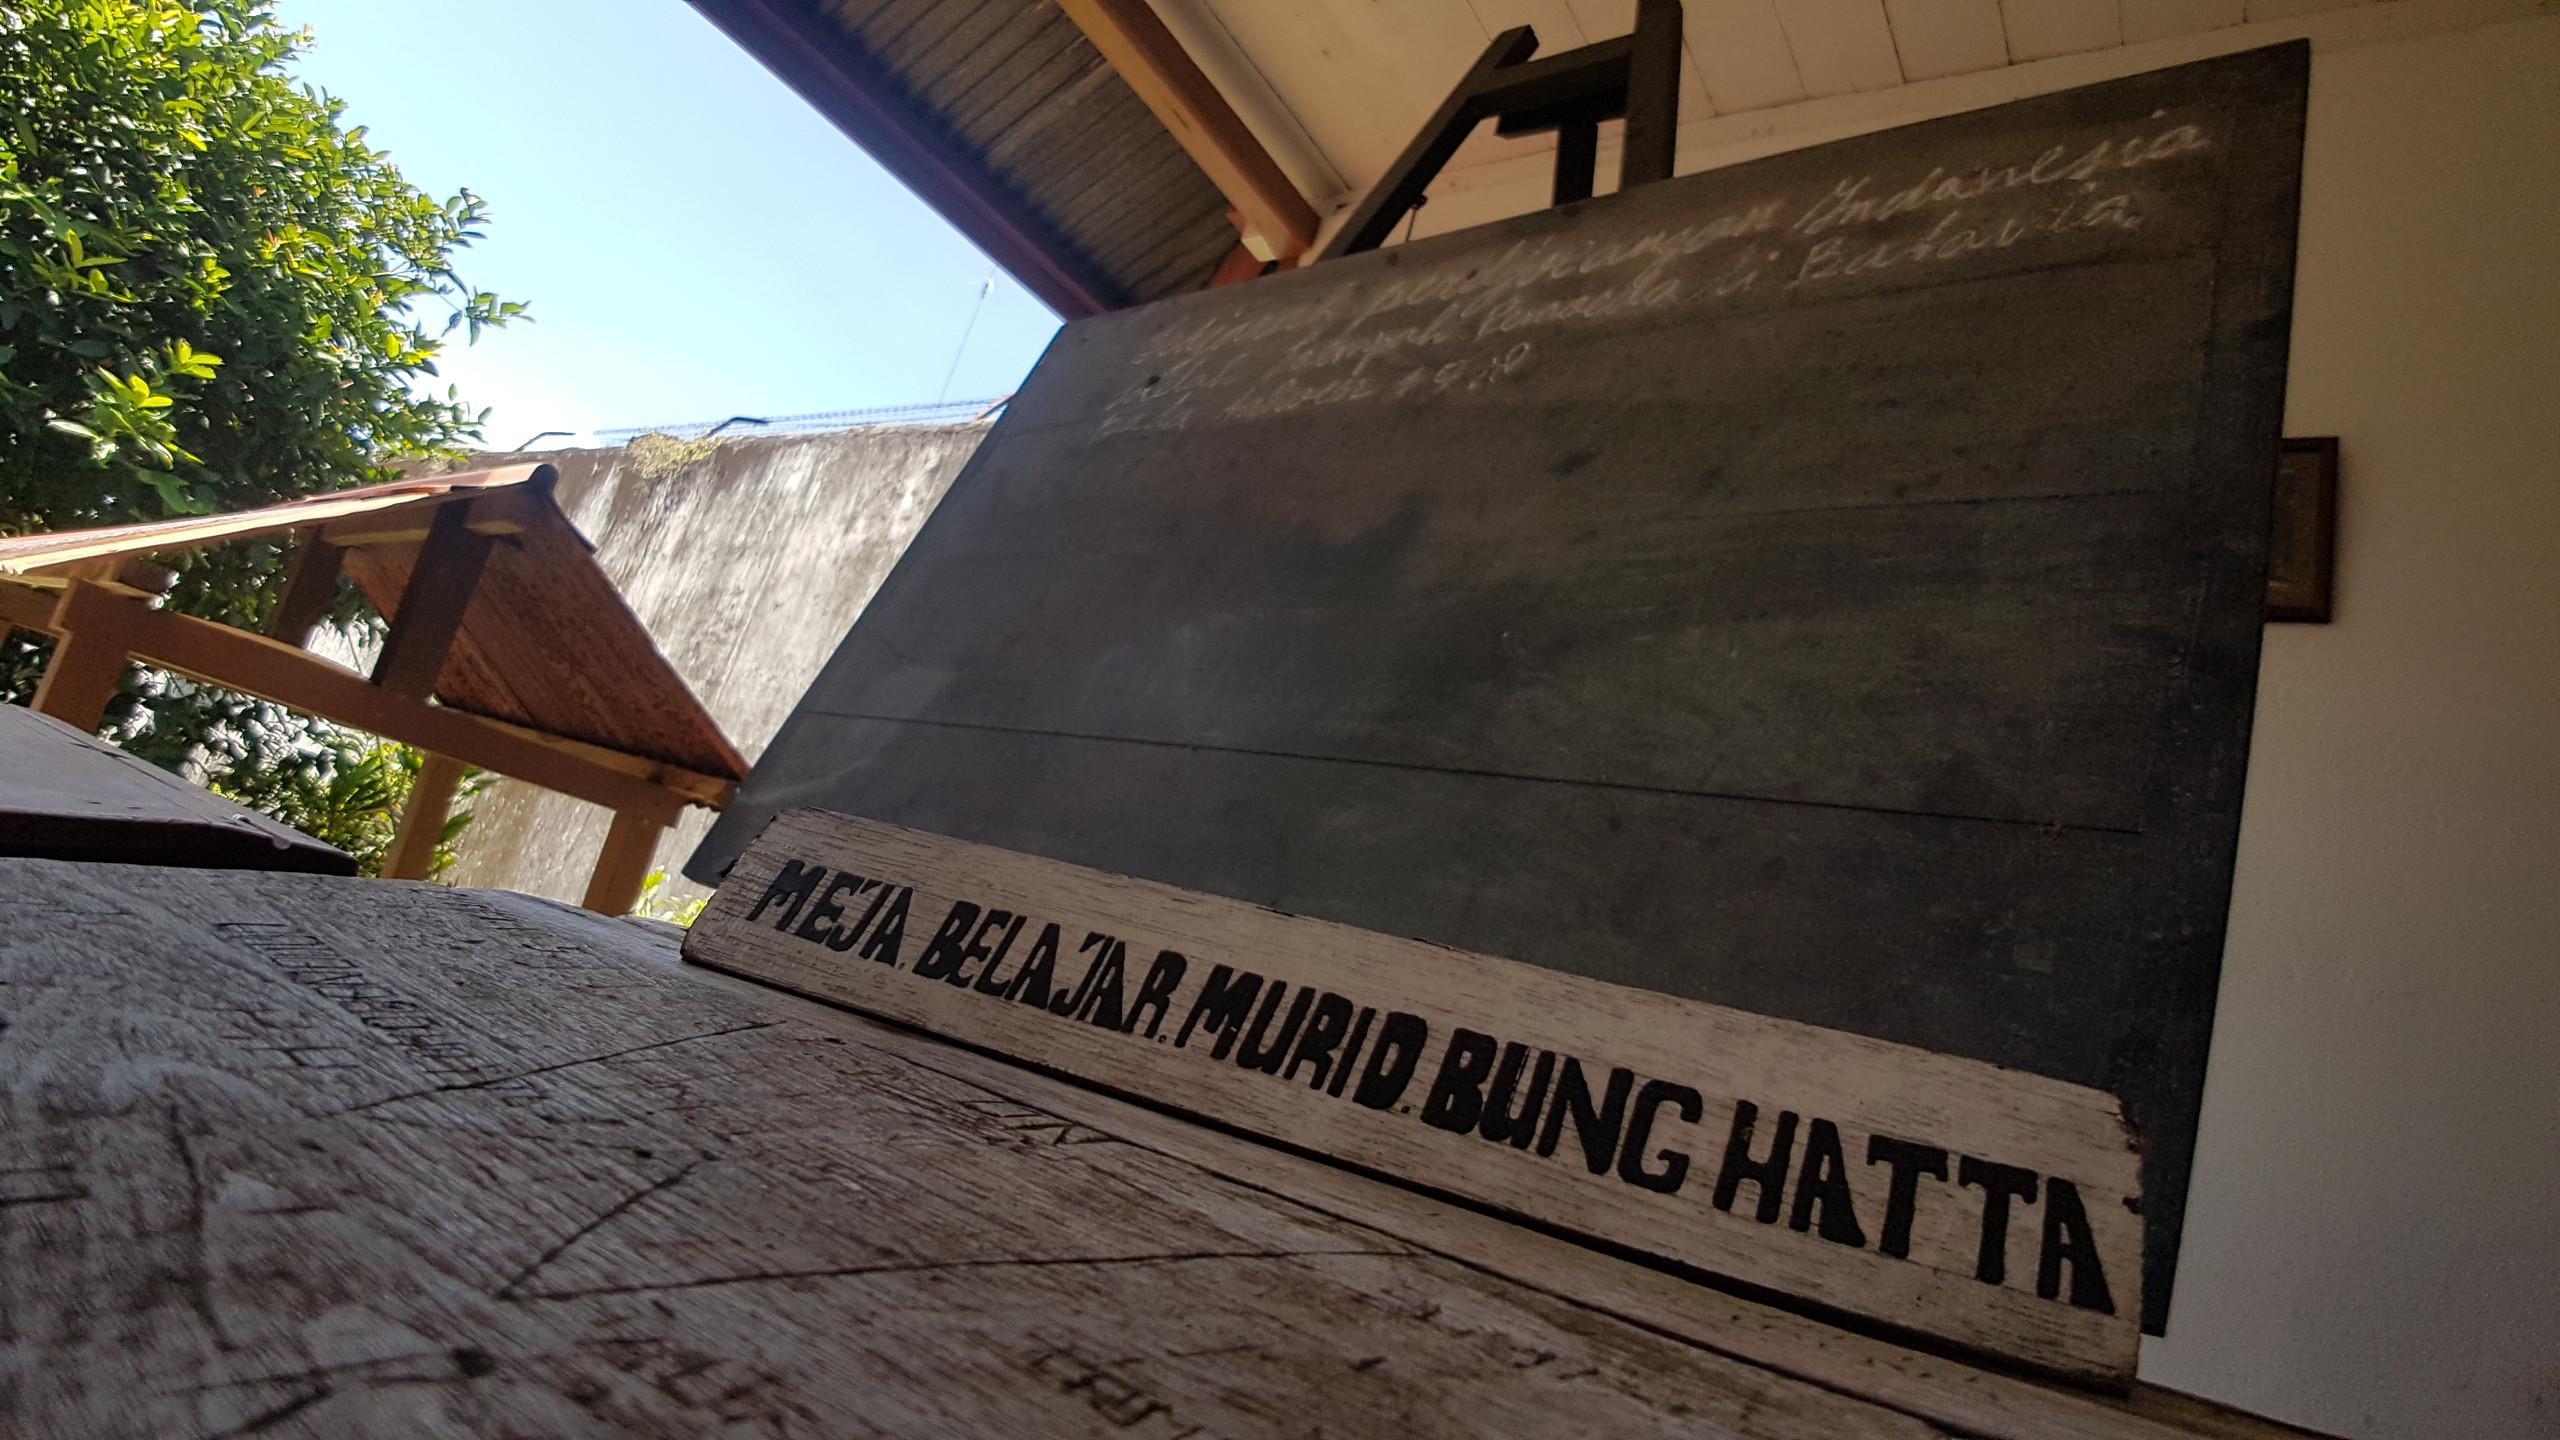 Meja dan papan tulis yang digunakan Mohammad Hatta untuk mengajar anak-anak warga sekitar di dekat rumah pengasingan di Jalan Hatta, Desa Dwi Warna, Kecamatan Banda, Banda Neira, Maluku. (Liputan6.com/Aditya Eka Prawira)